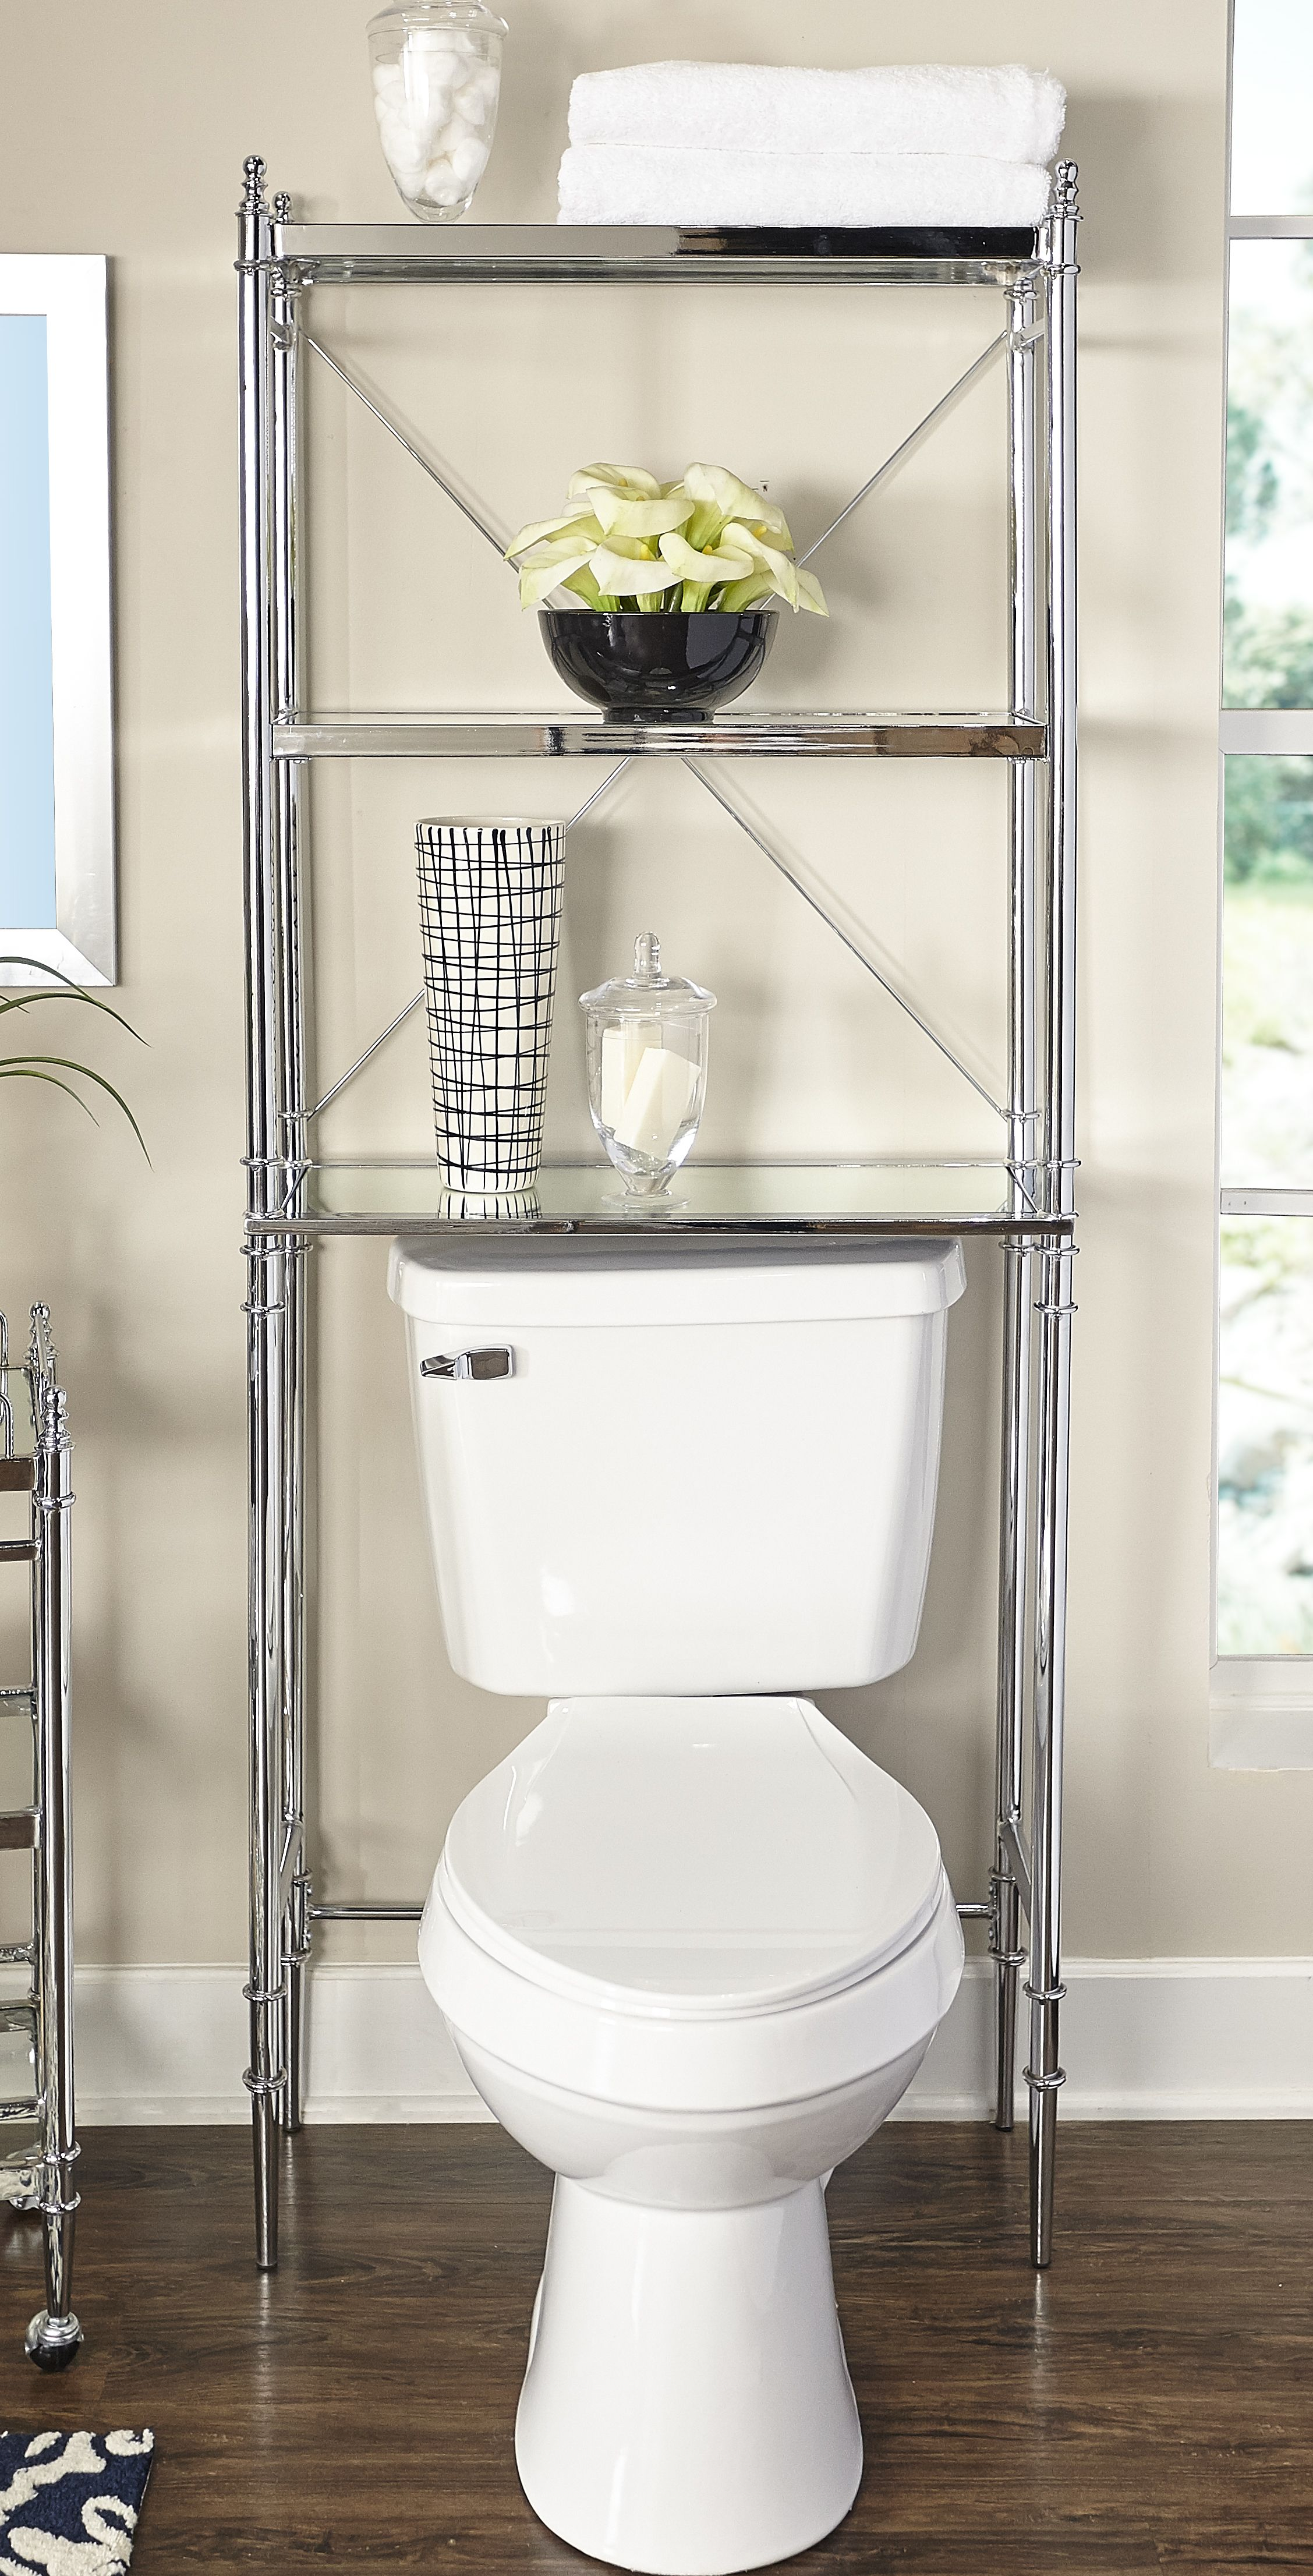 Linon Pinnacle Chrome And Glass Spacesaver Silver Toilet Storage Bathroom Shelves Over Toilet Shelves Over Toilet